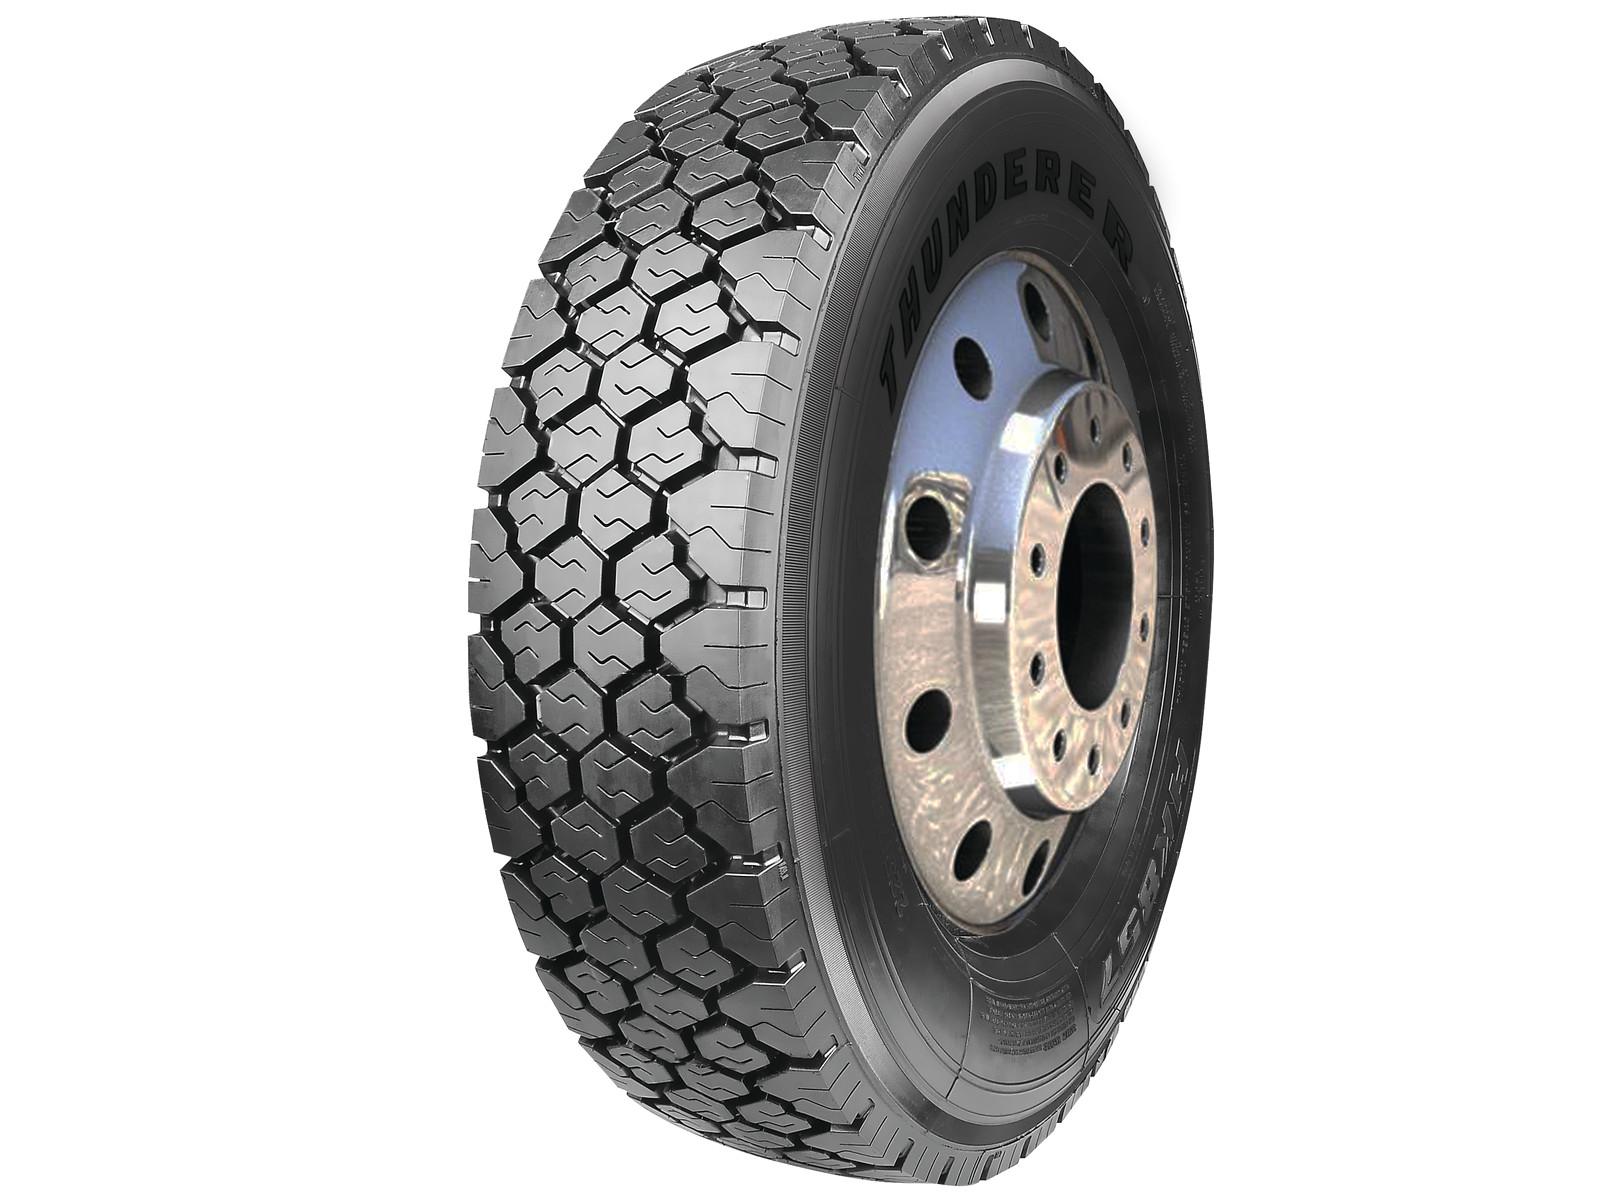 Dons Tire Abilene Ks Don S Tire Supply Quality Tire Sales and Abilene Kansas